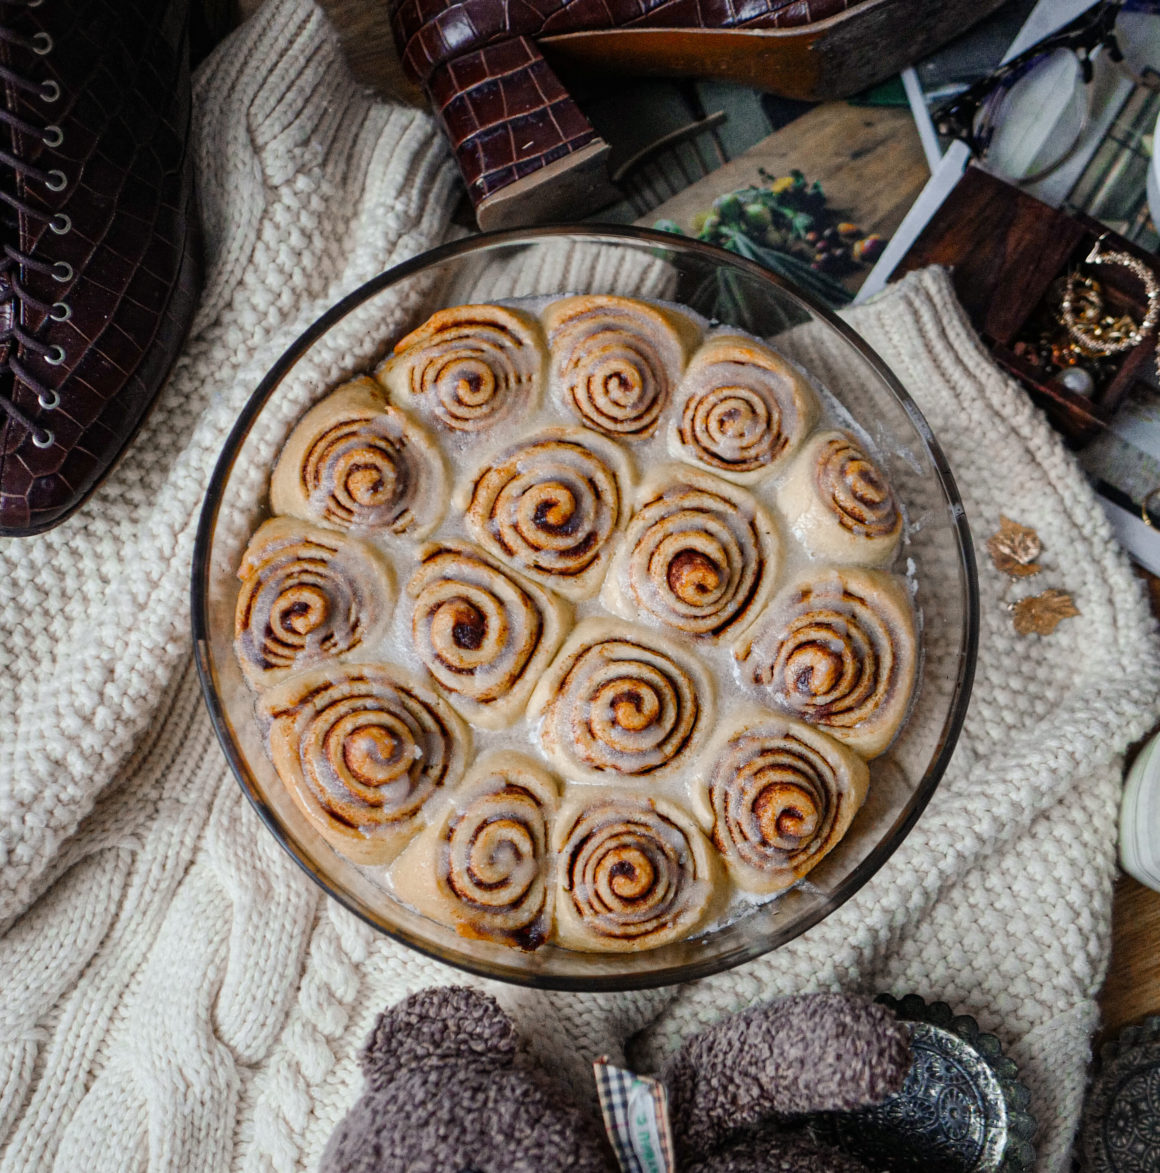 Les cinnamon rolls